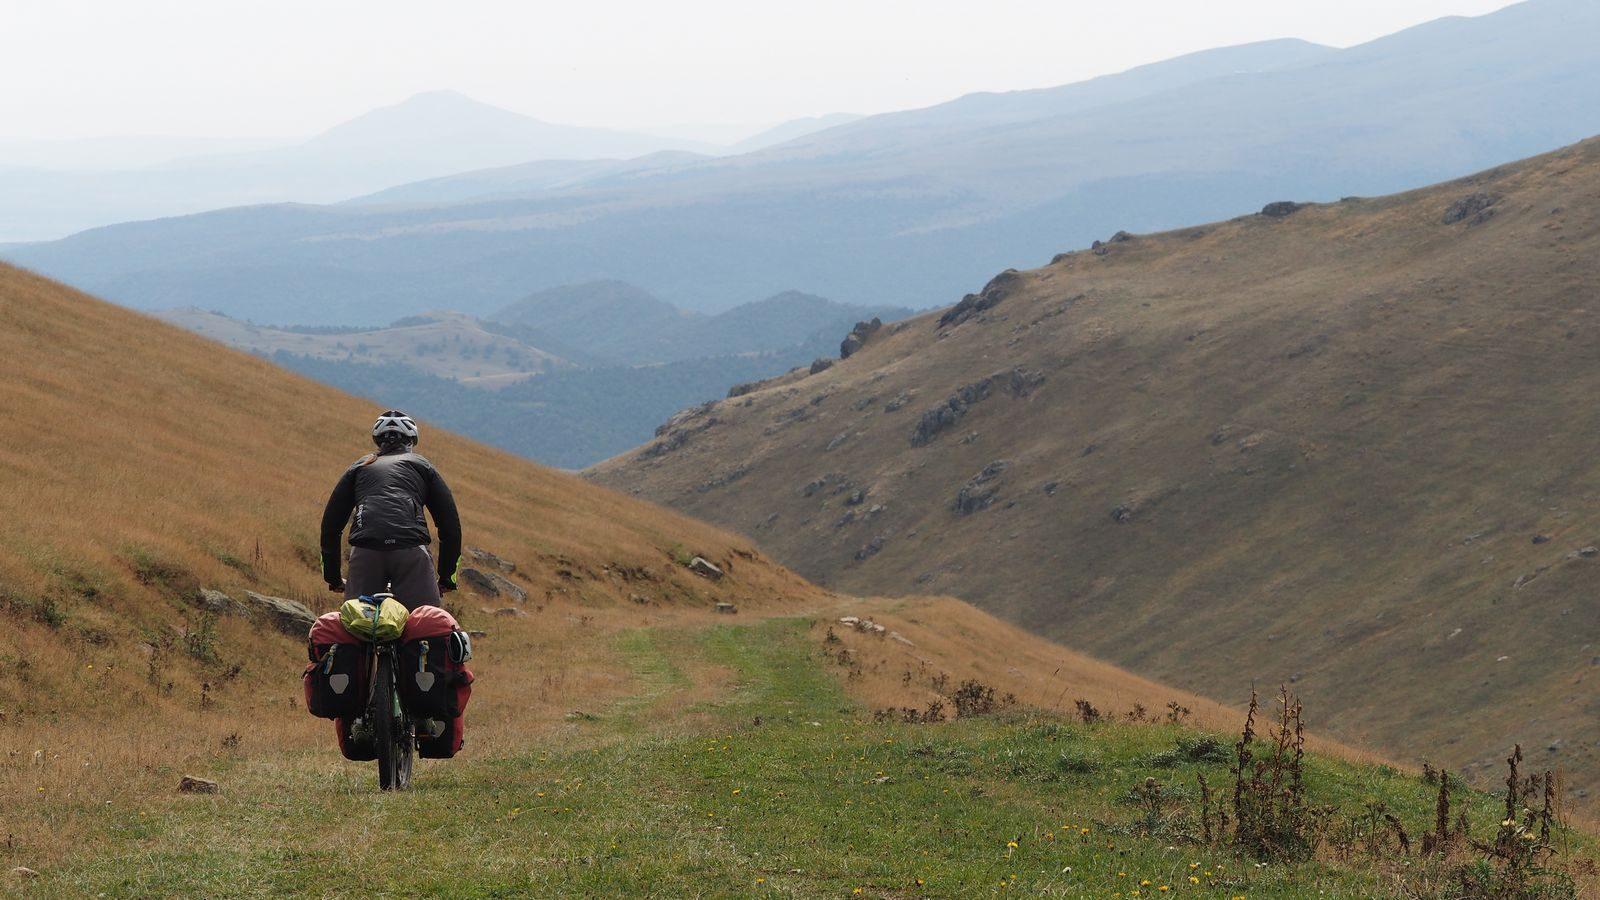 Radreise Armenien - Abfahrt vom Margahovit-Pass